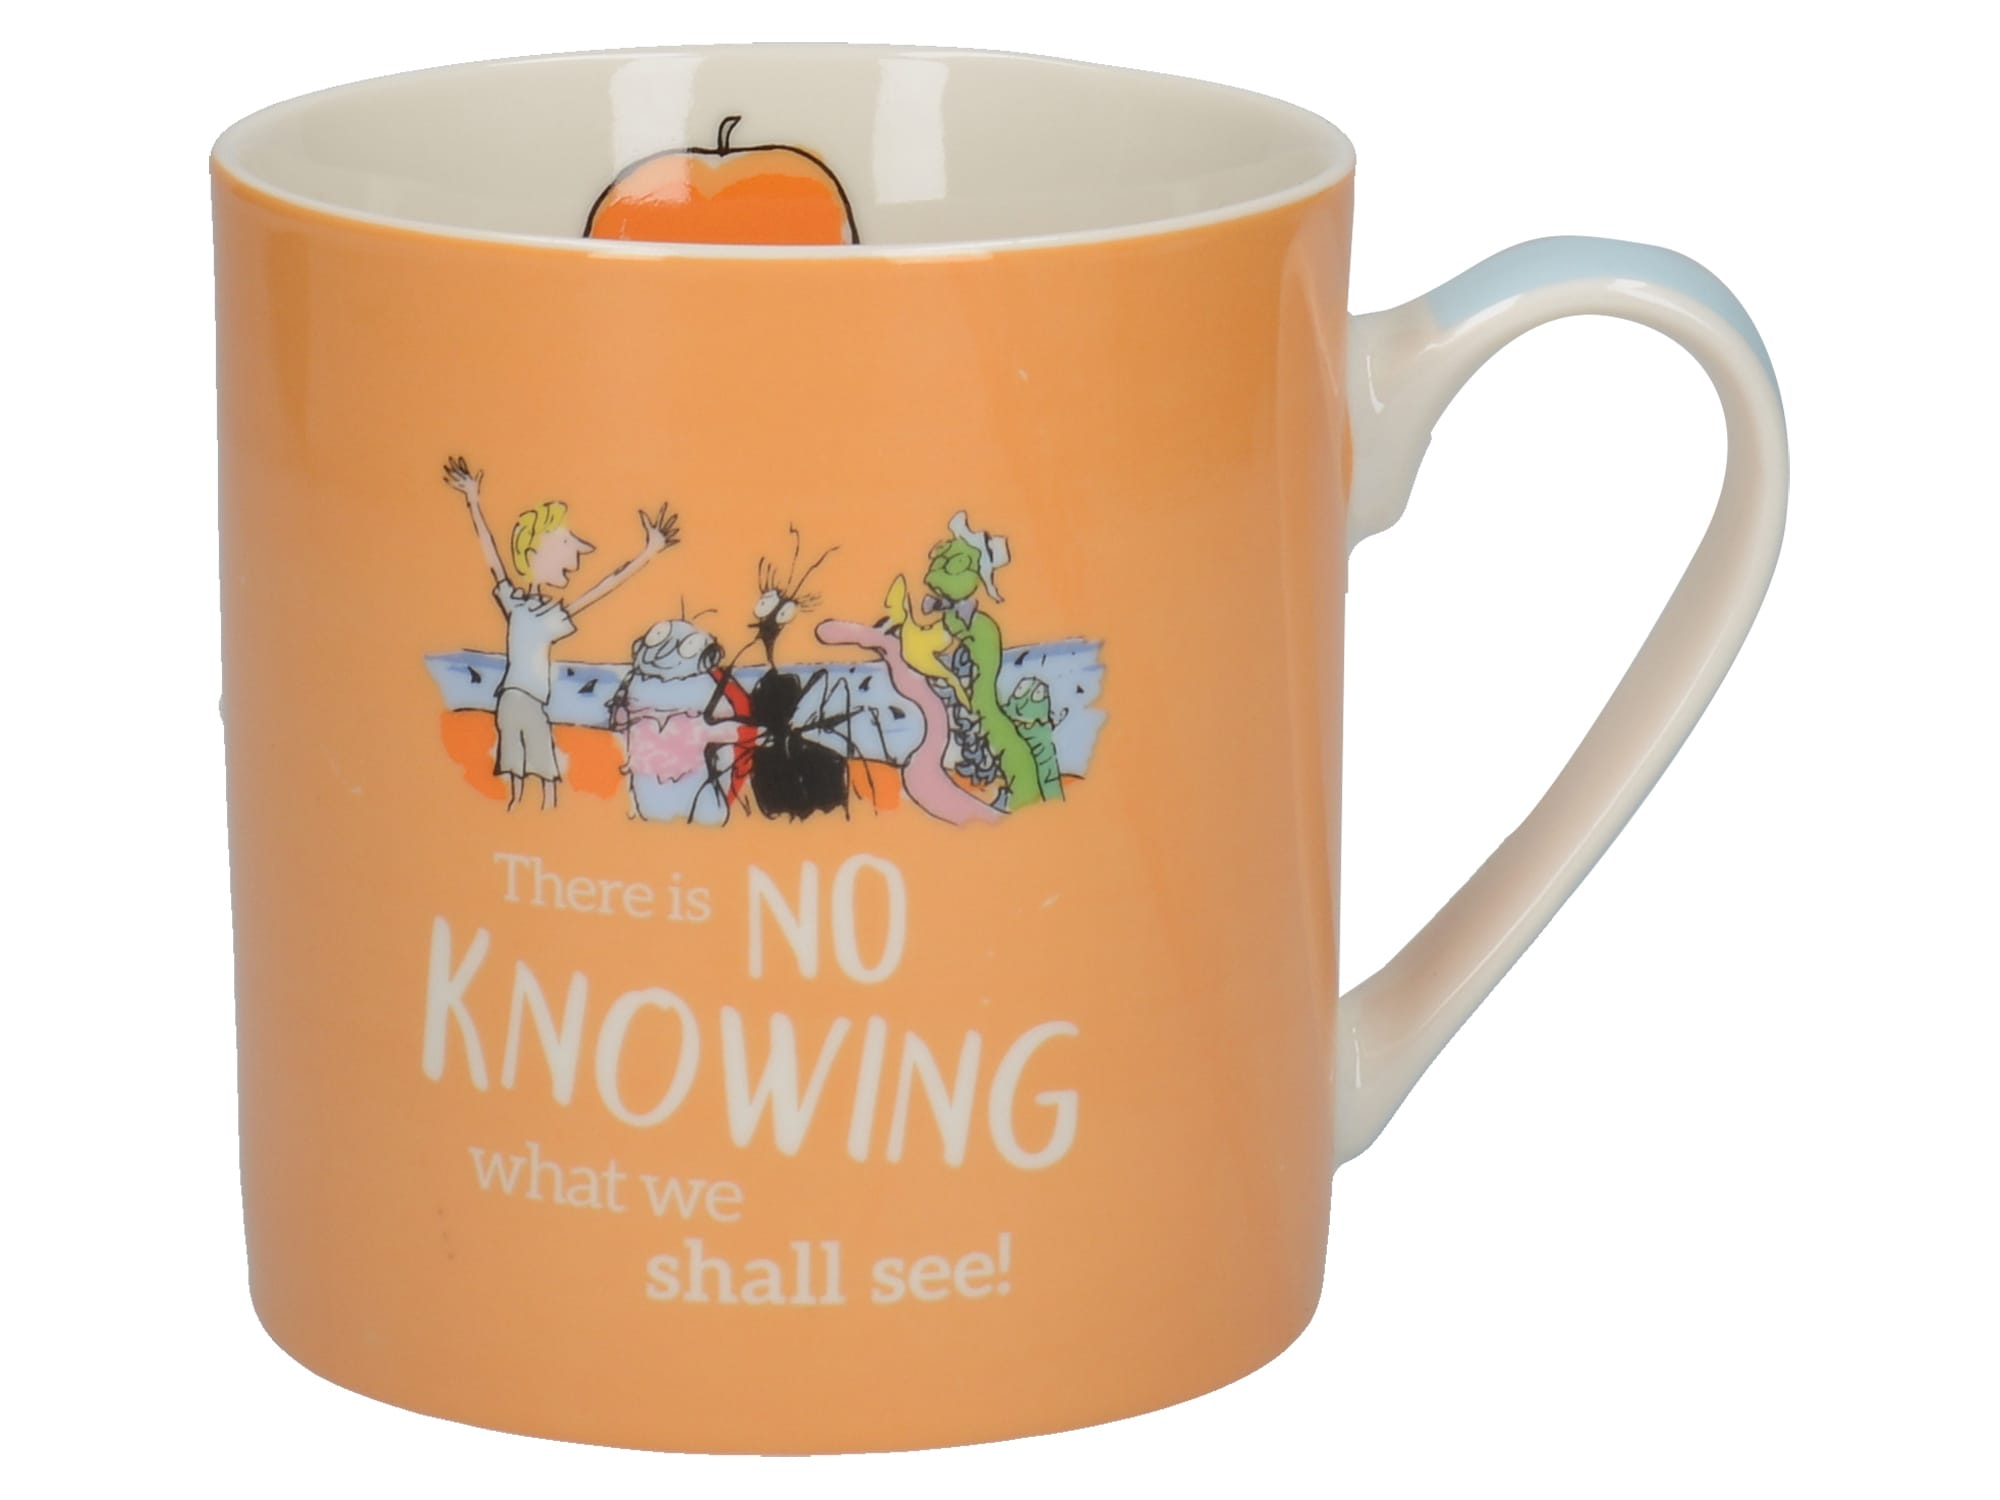 Creative tops James Giant Peach Can Mug